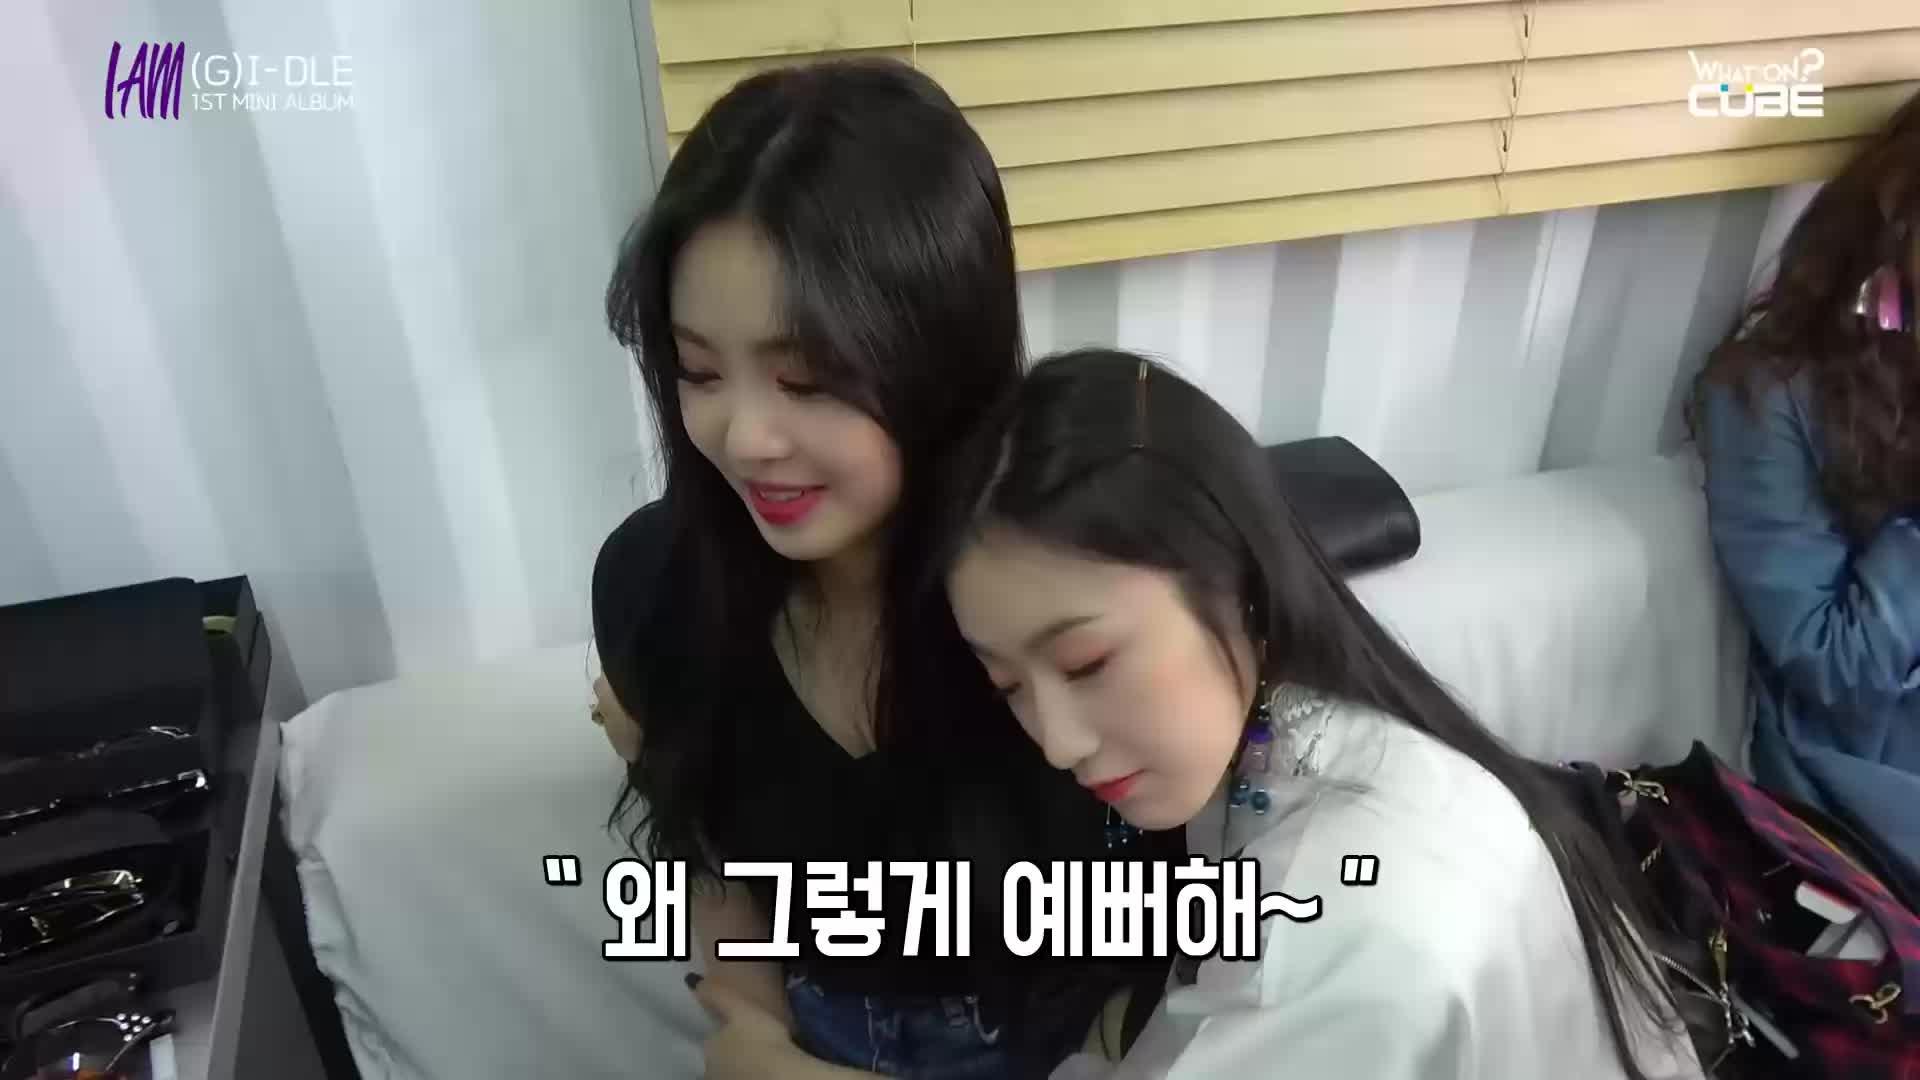 (G)I-DLE, Love, Shuhua, Soojin, Tsundere, Shuhua loves tsundere Soojin unnie GIFs